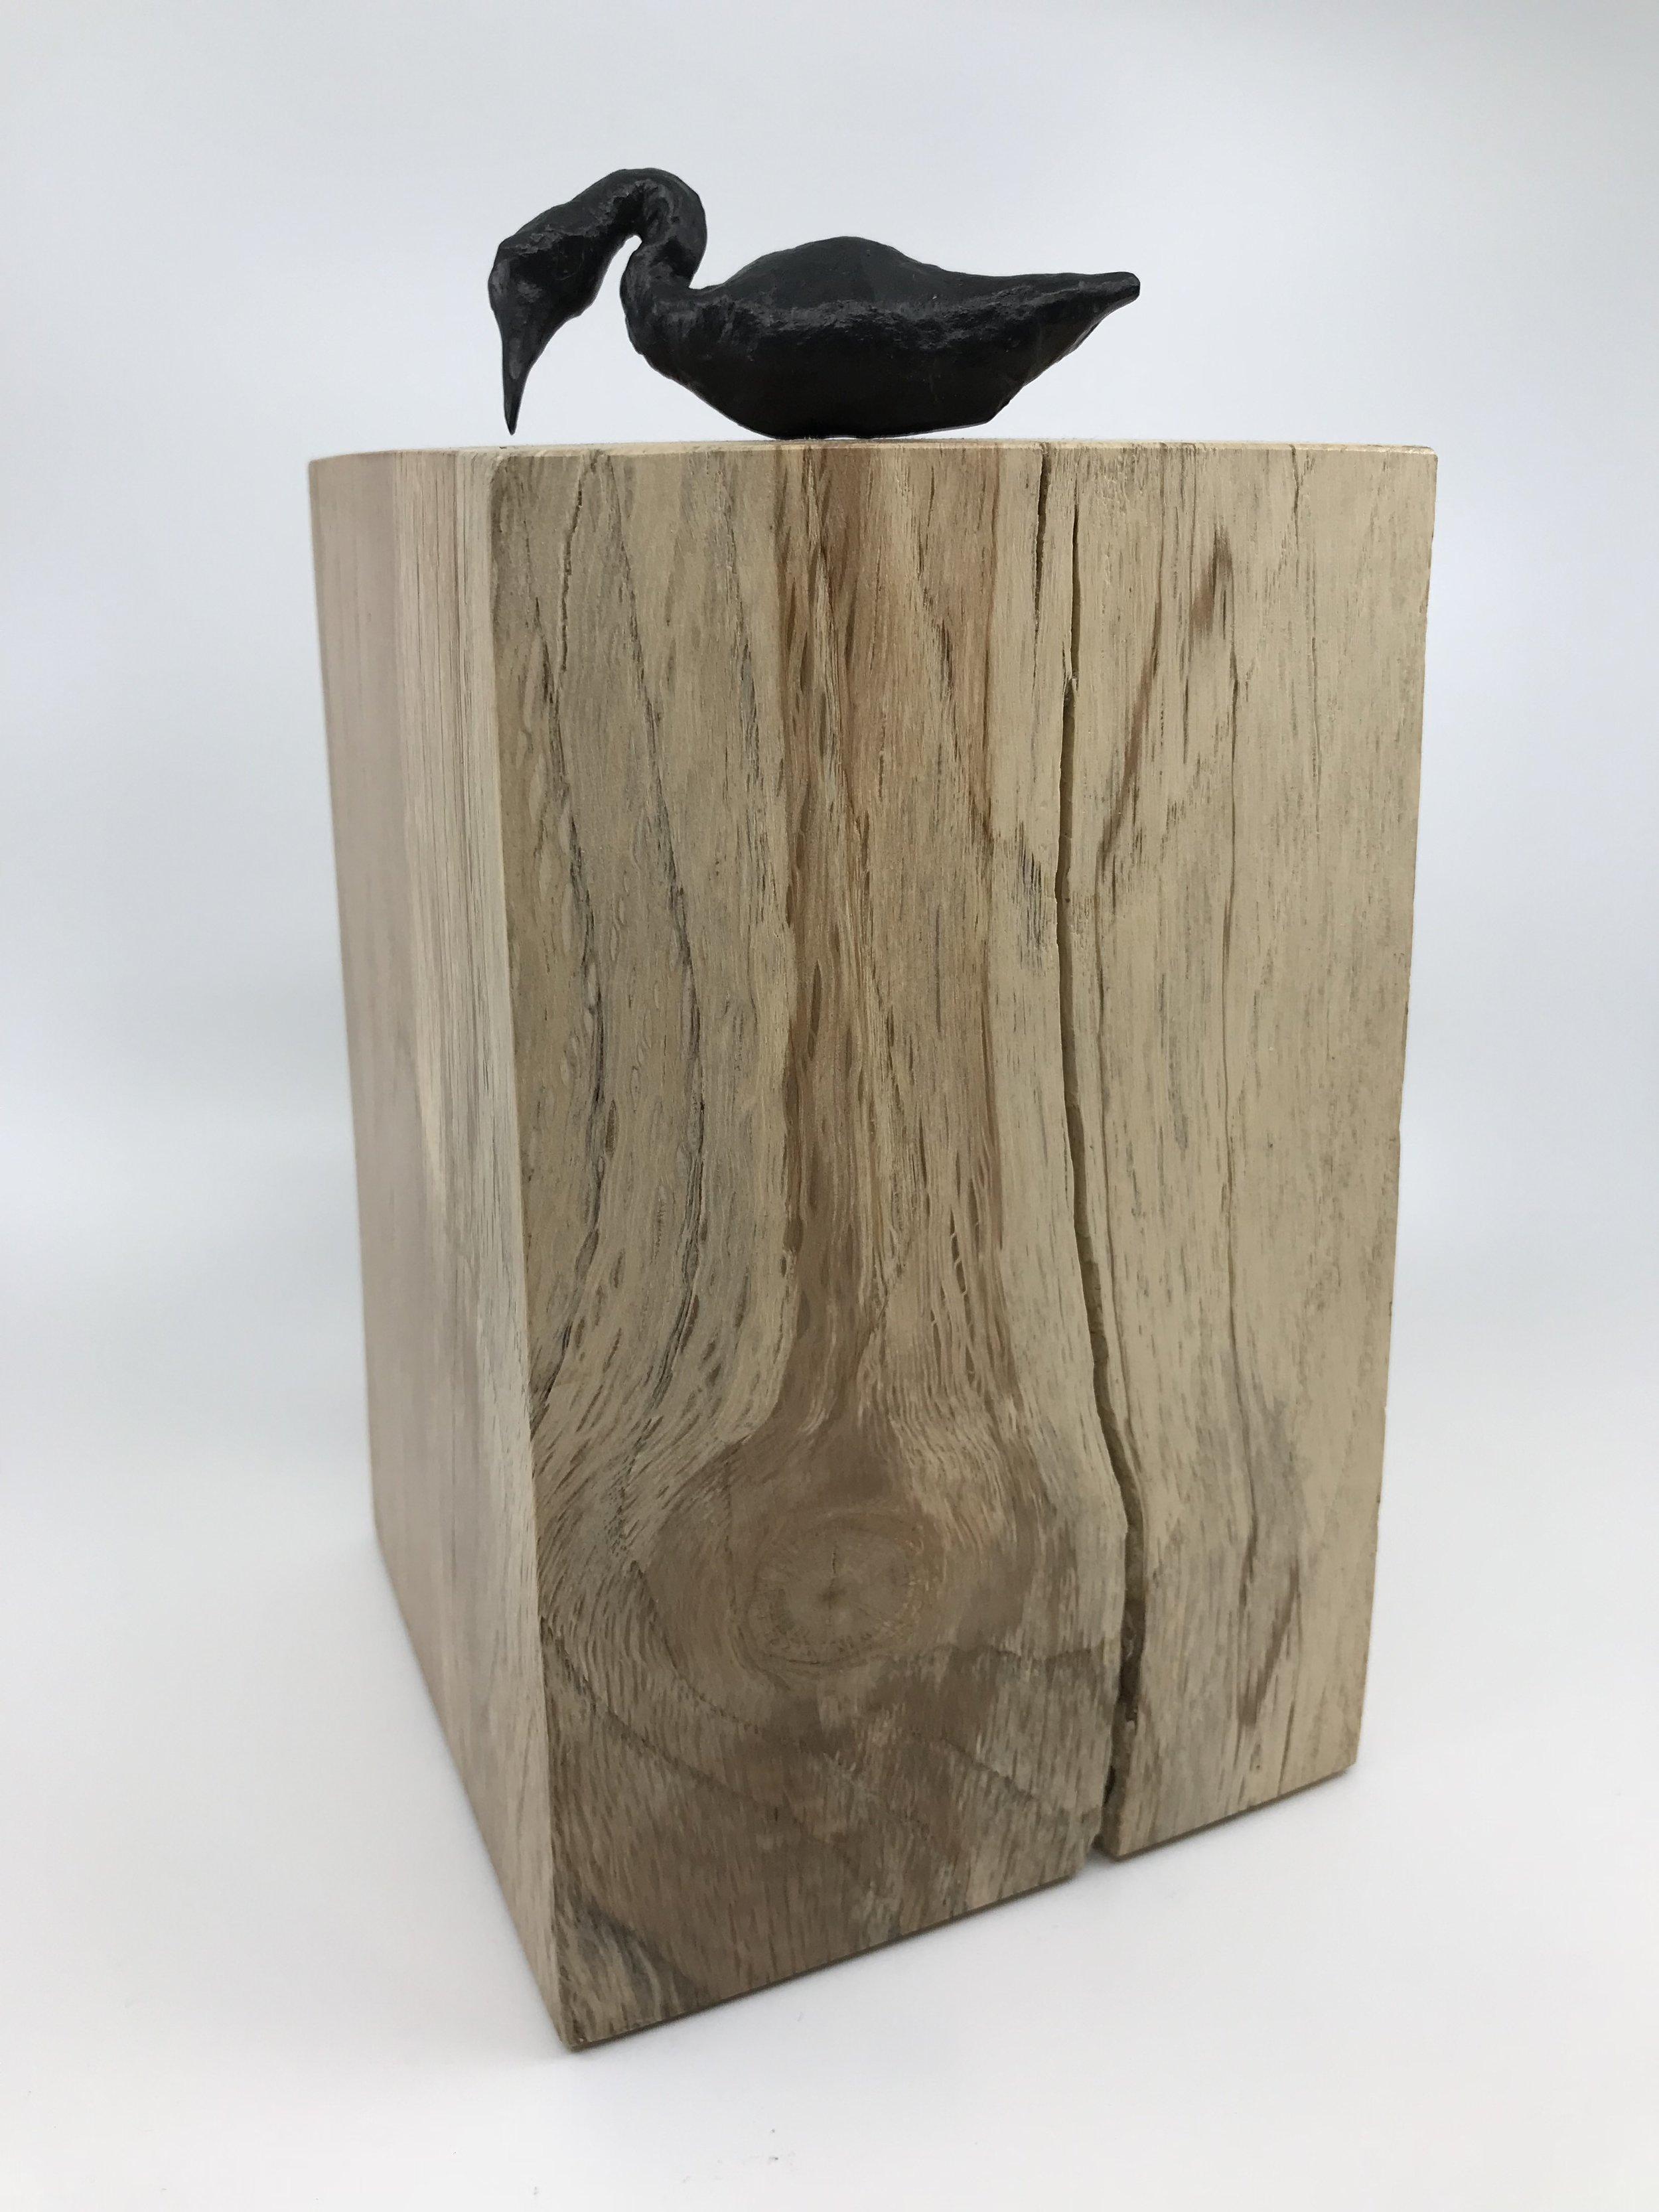 Bird Form 2 on Perch, 2018